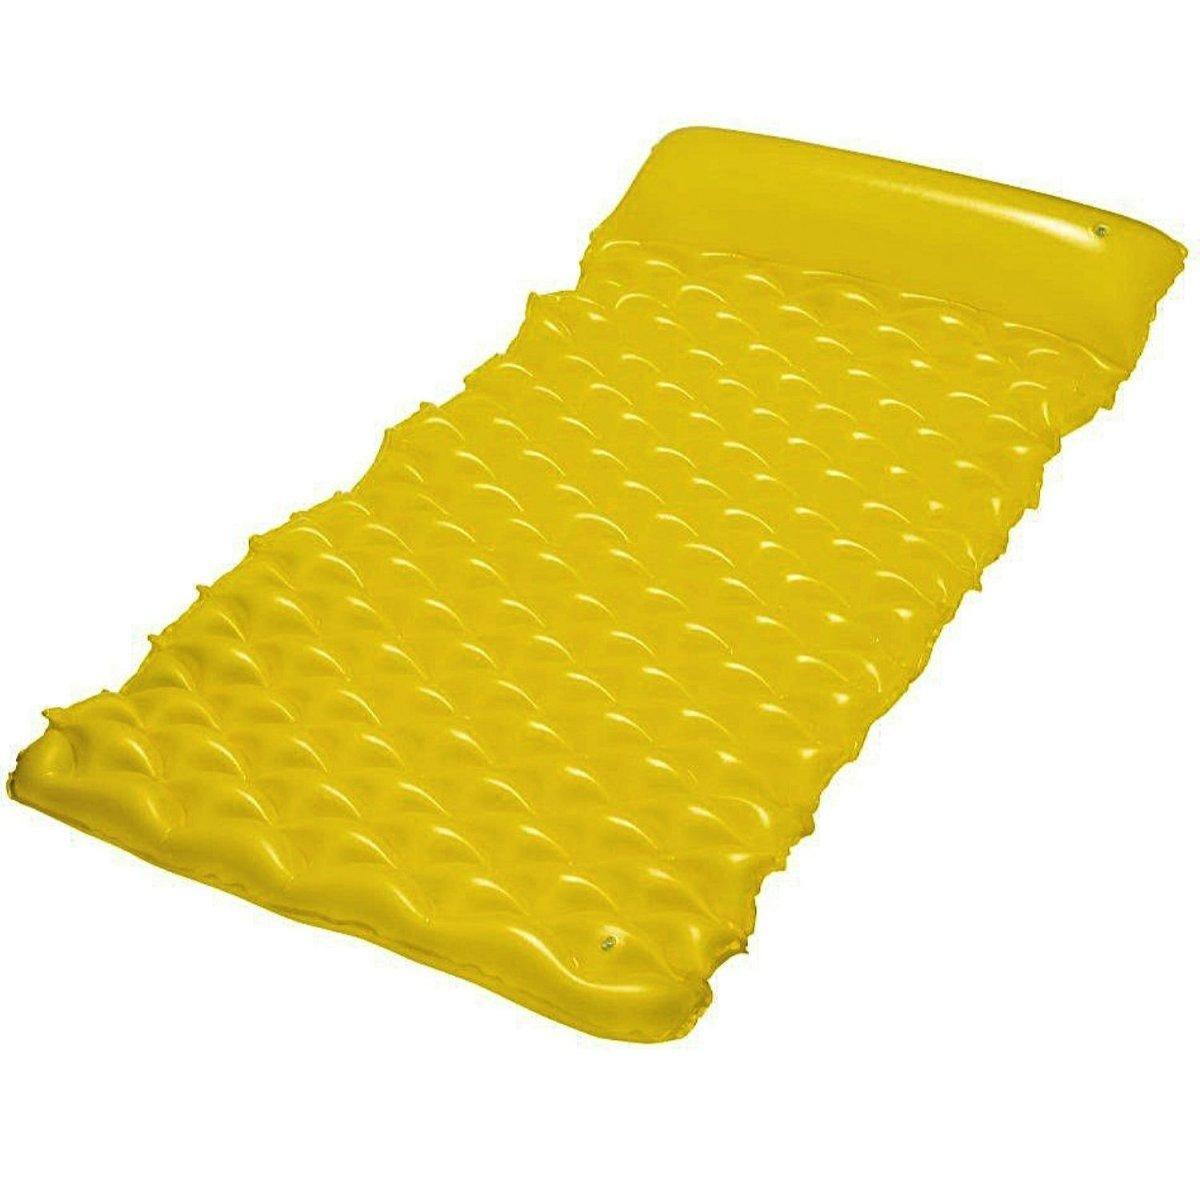 Пляжный надувной матрас-ролл Bestway 44020 213 х 86 см Желтый (RT-8770s9351)